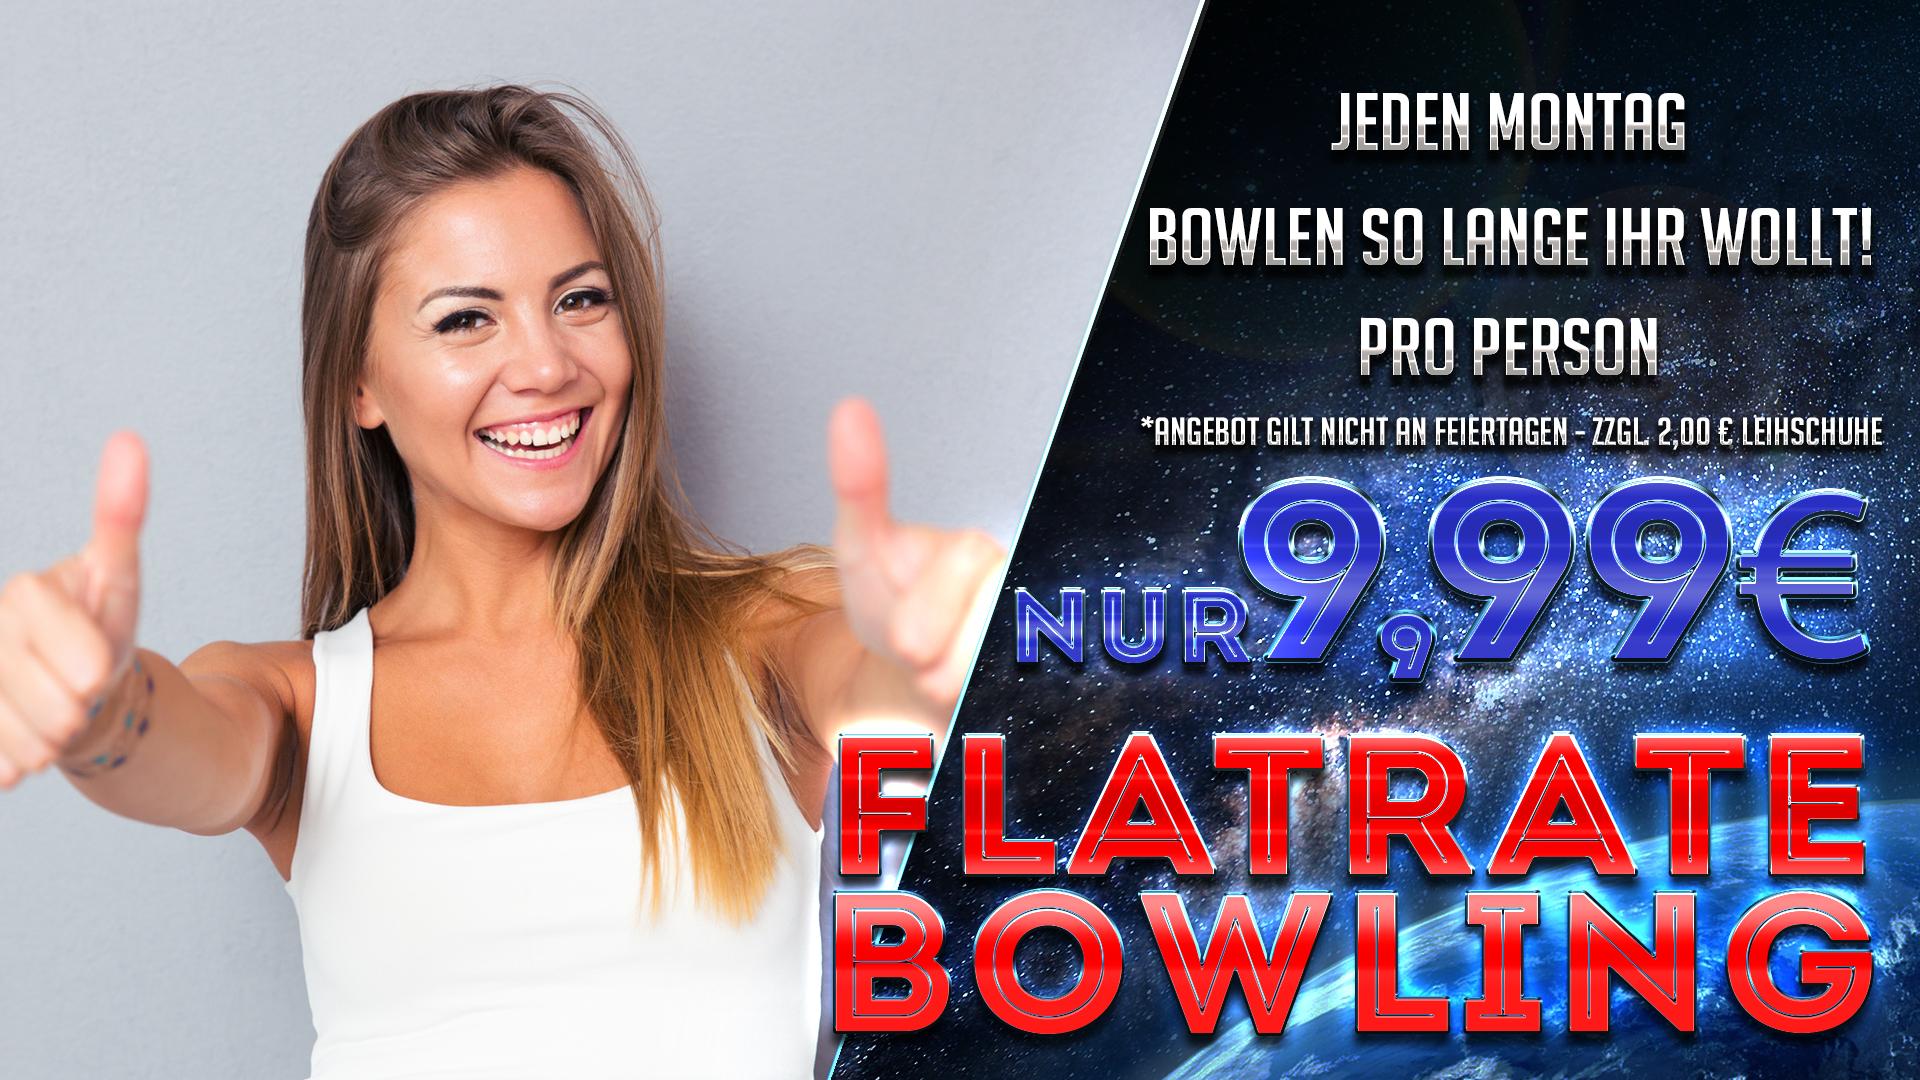 Flatrate Bowling